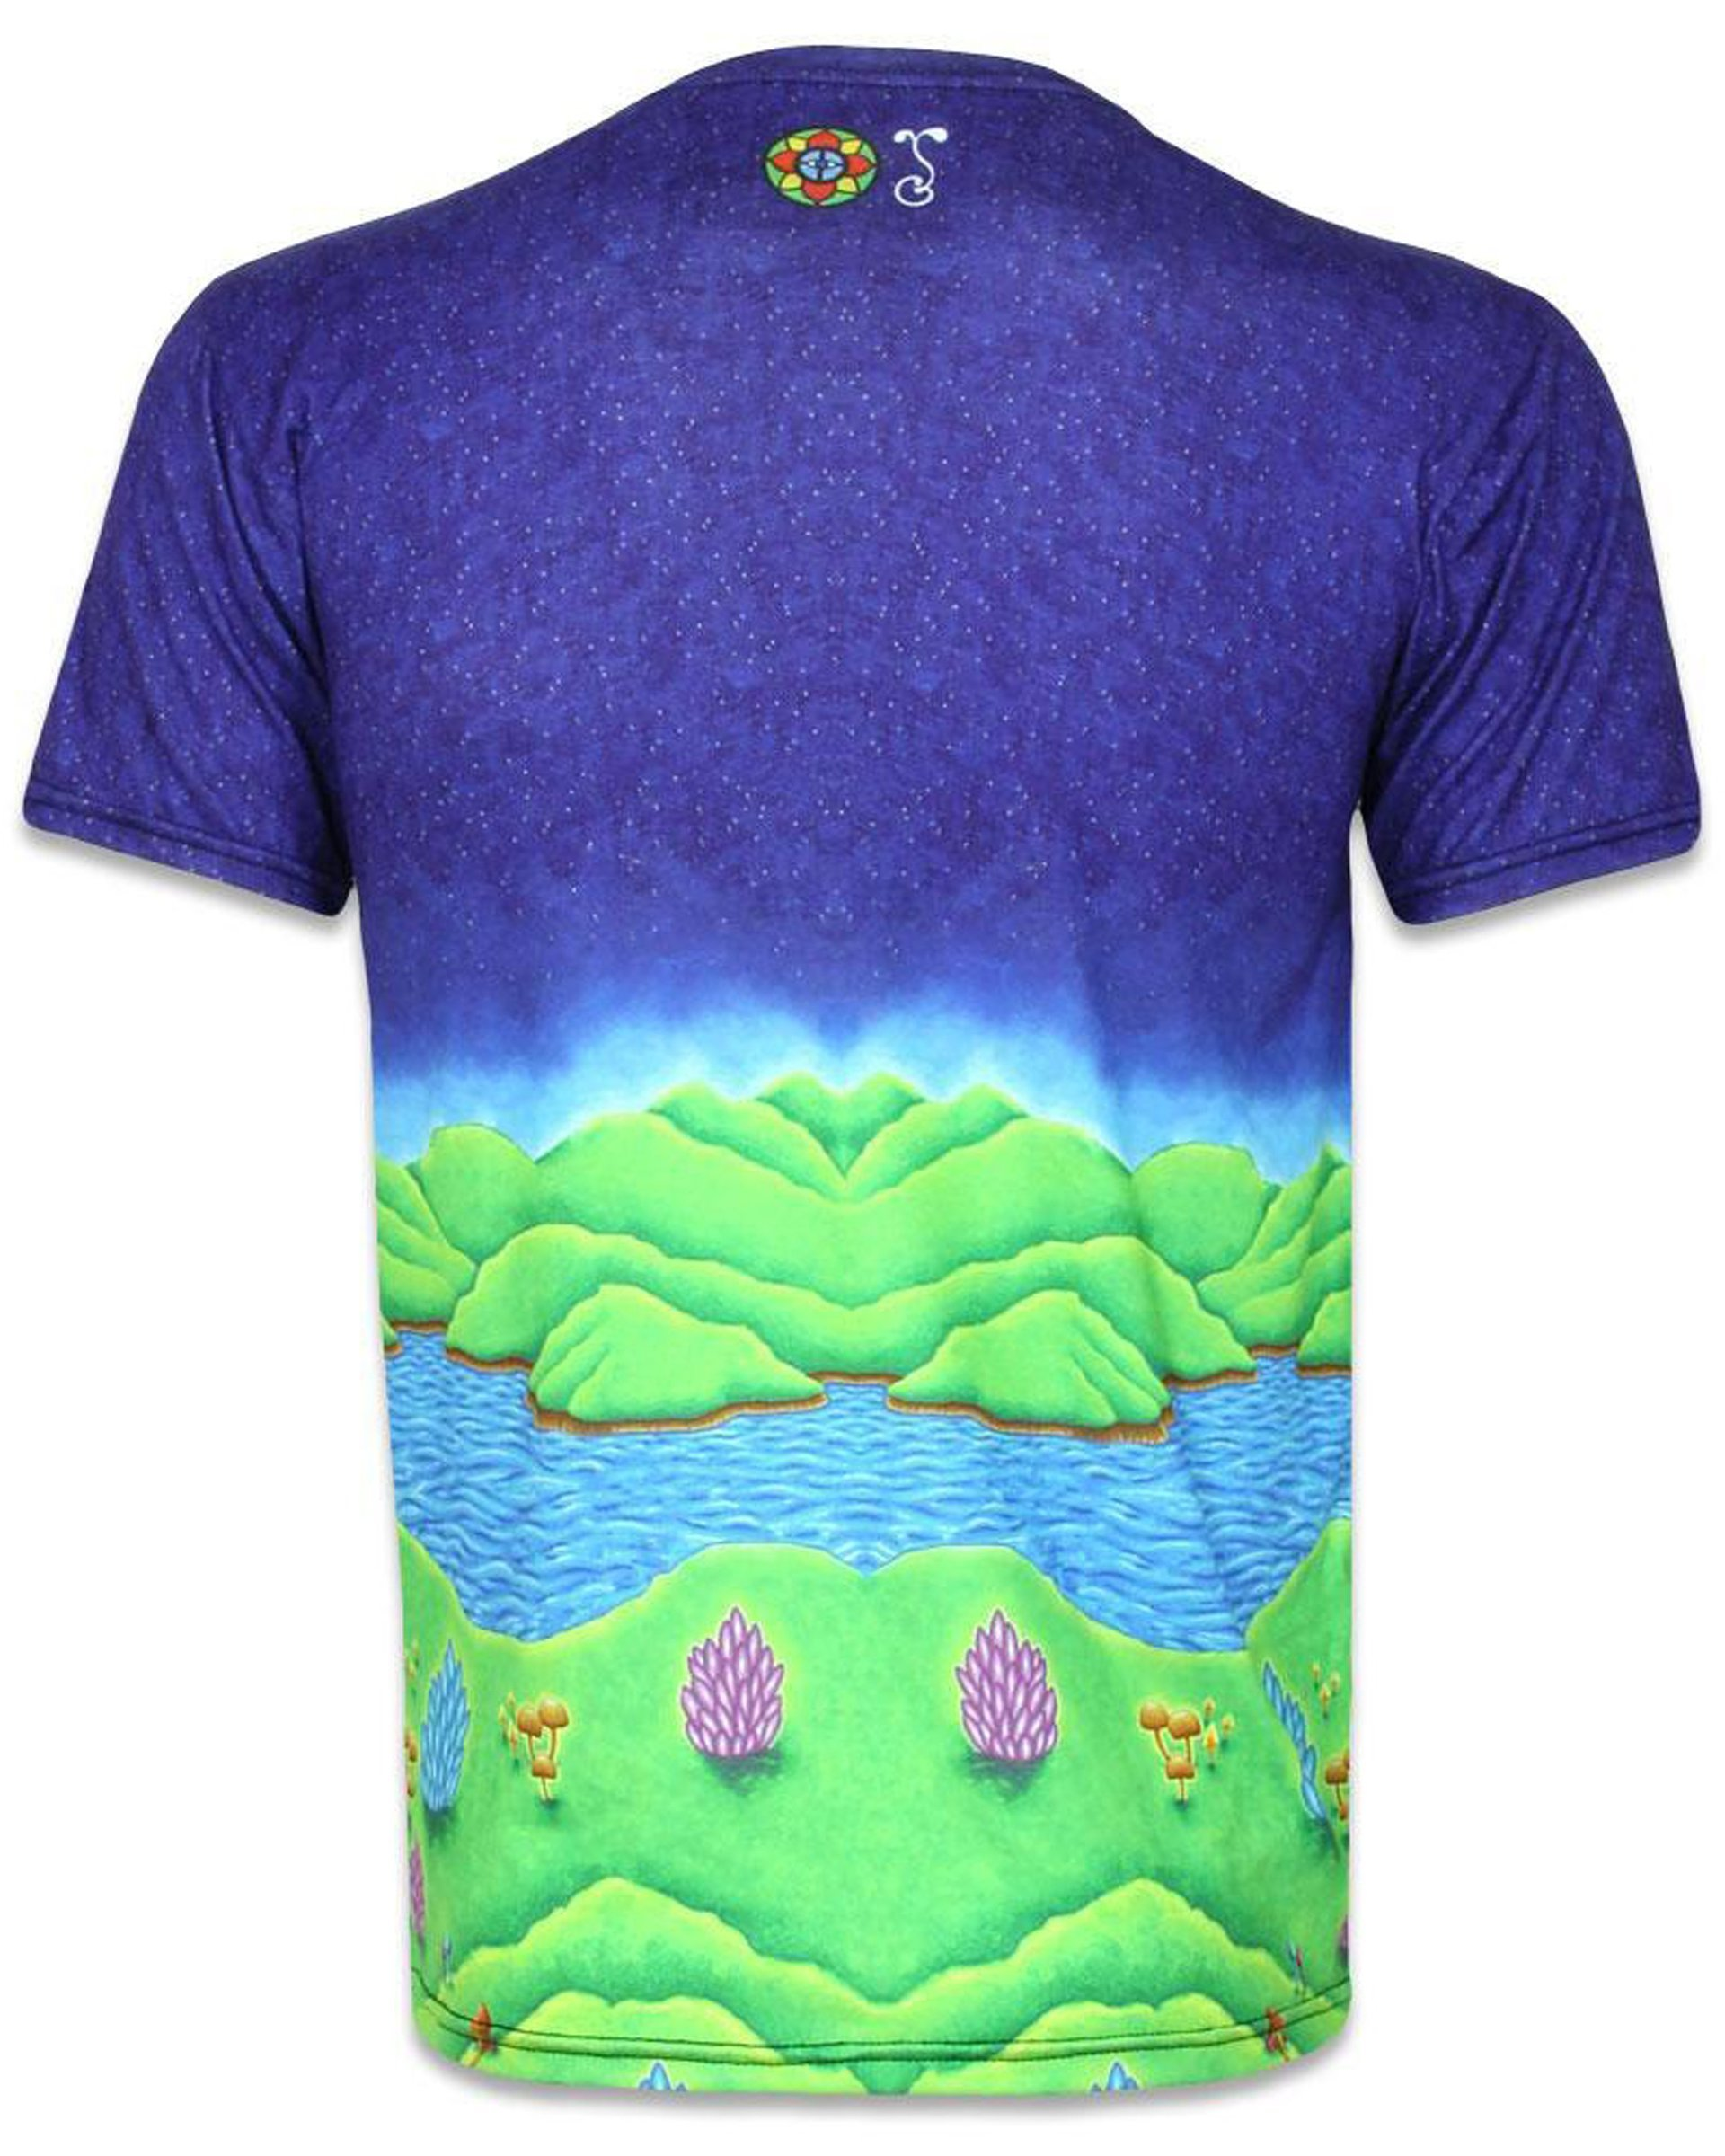 81f507b4 Muncher of Mushroomland Short Sleeve Men's T-Shirt (Back)